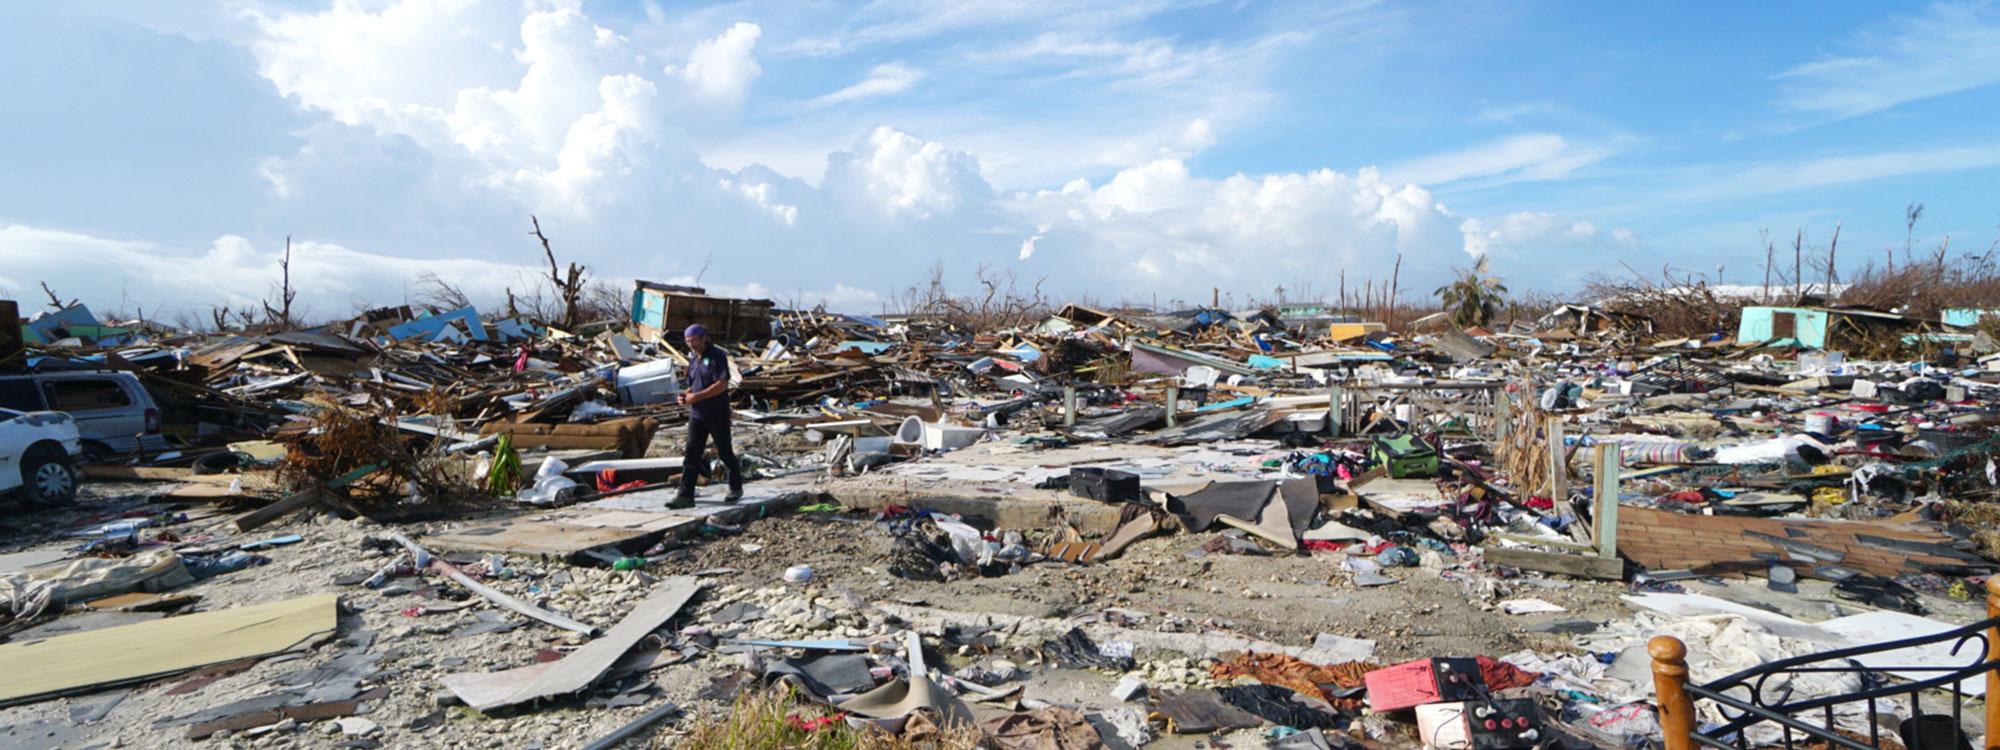 Man walks amongst widespread destruction in the Bahamas in 2019, following hurricane Dorian